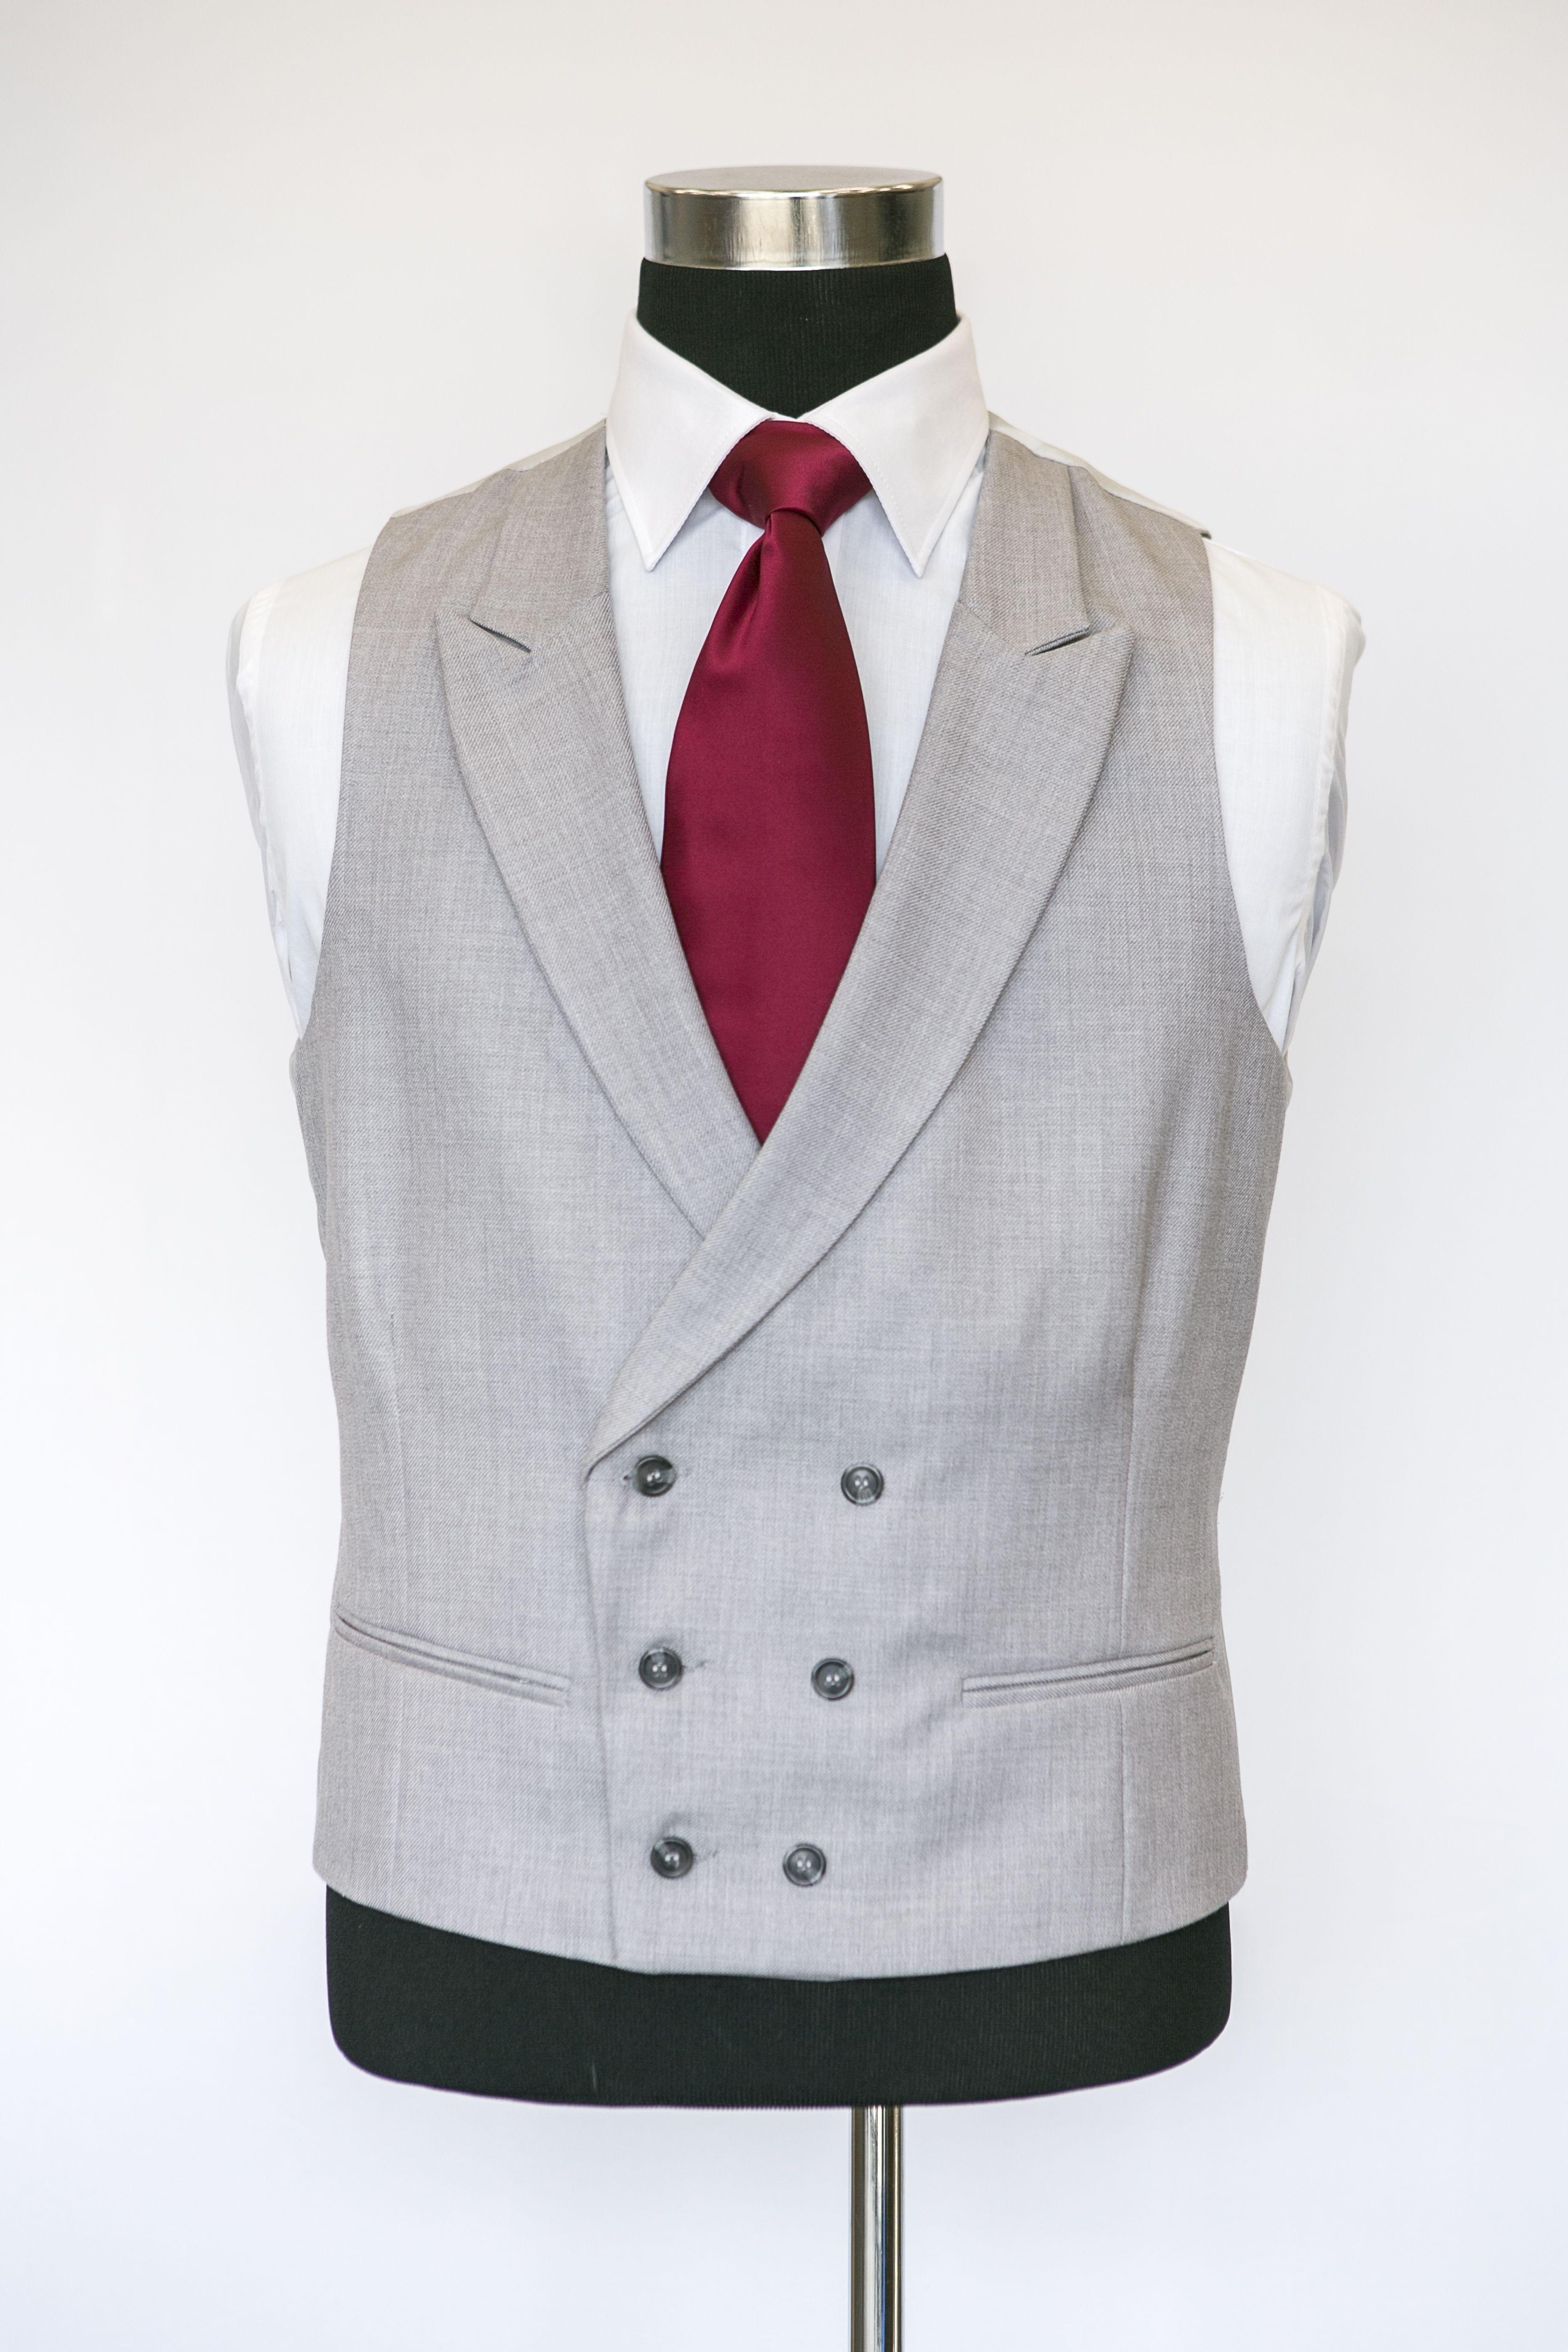 Grey Double Breasted Waistcoat With A Burgandy Tie Waistcoat Wedding Waistcoats Groom Vest